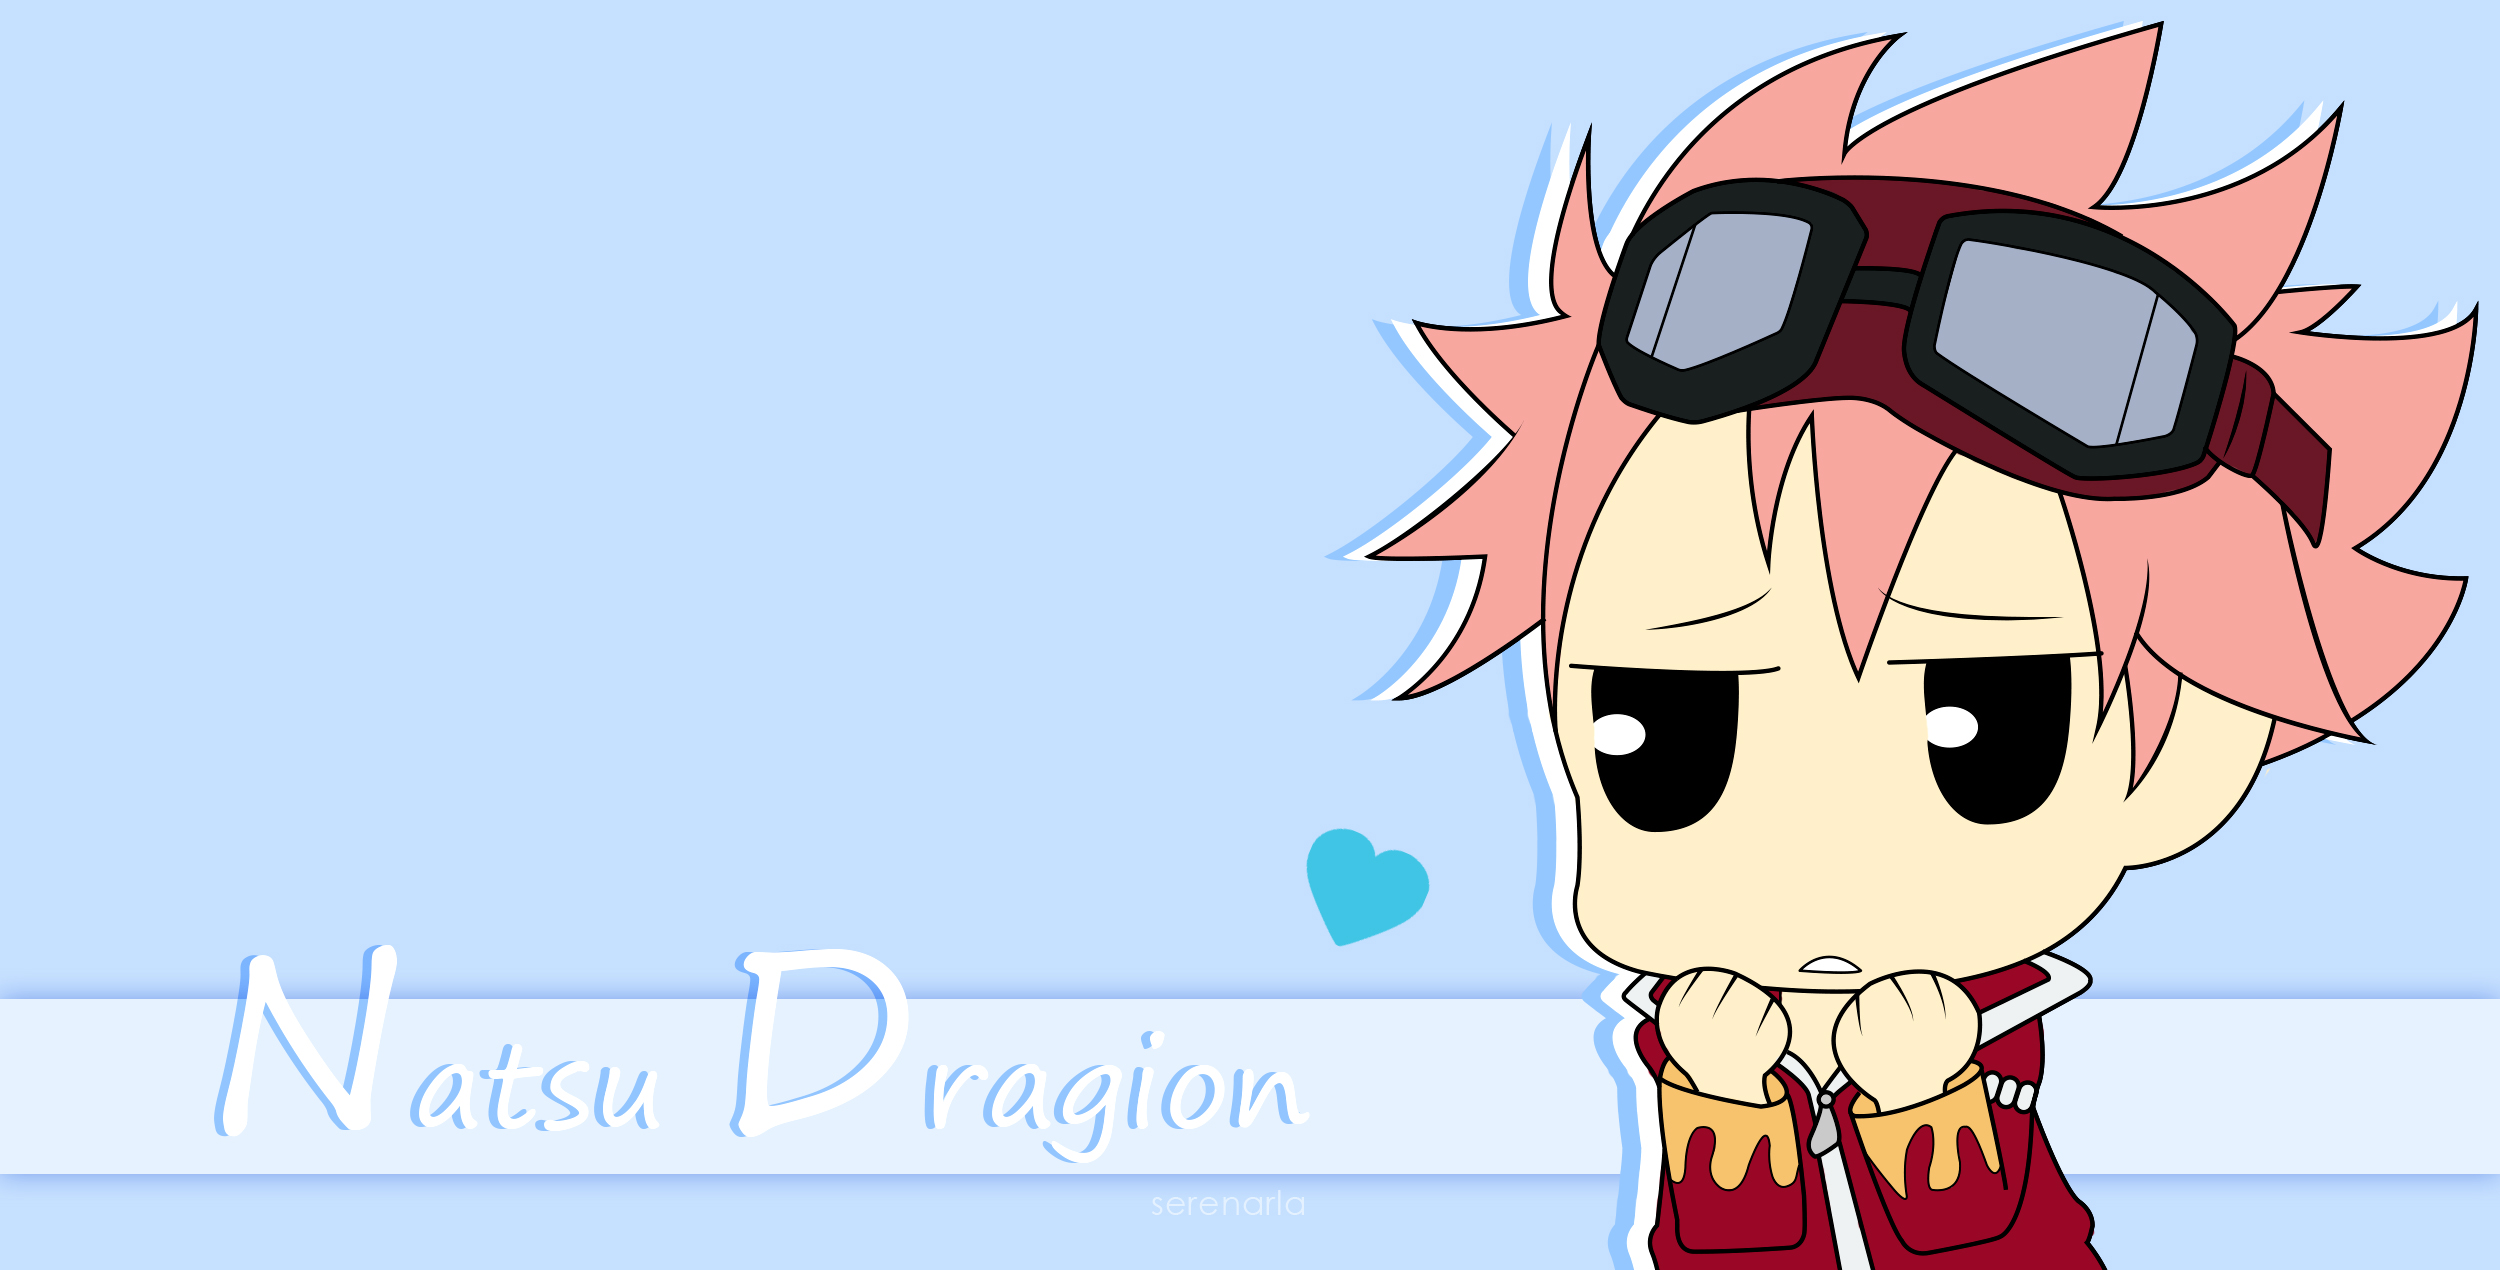 Chibi Natsu Dragion   Fairy Tail [Photoshop] by Serenarla on 2500x1270